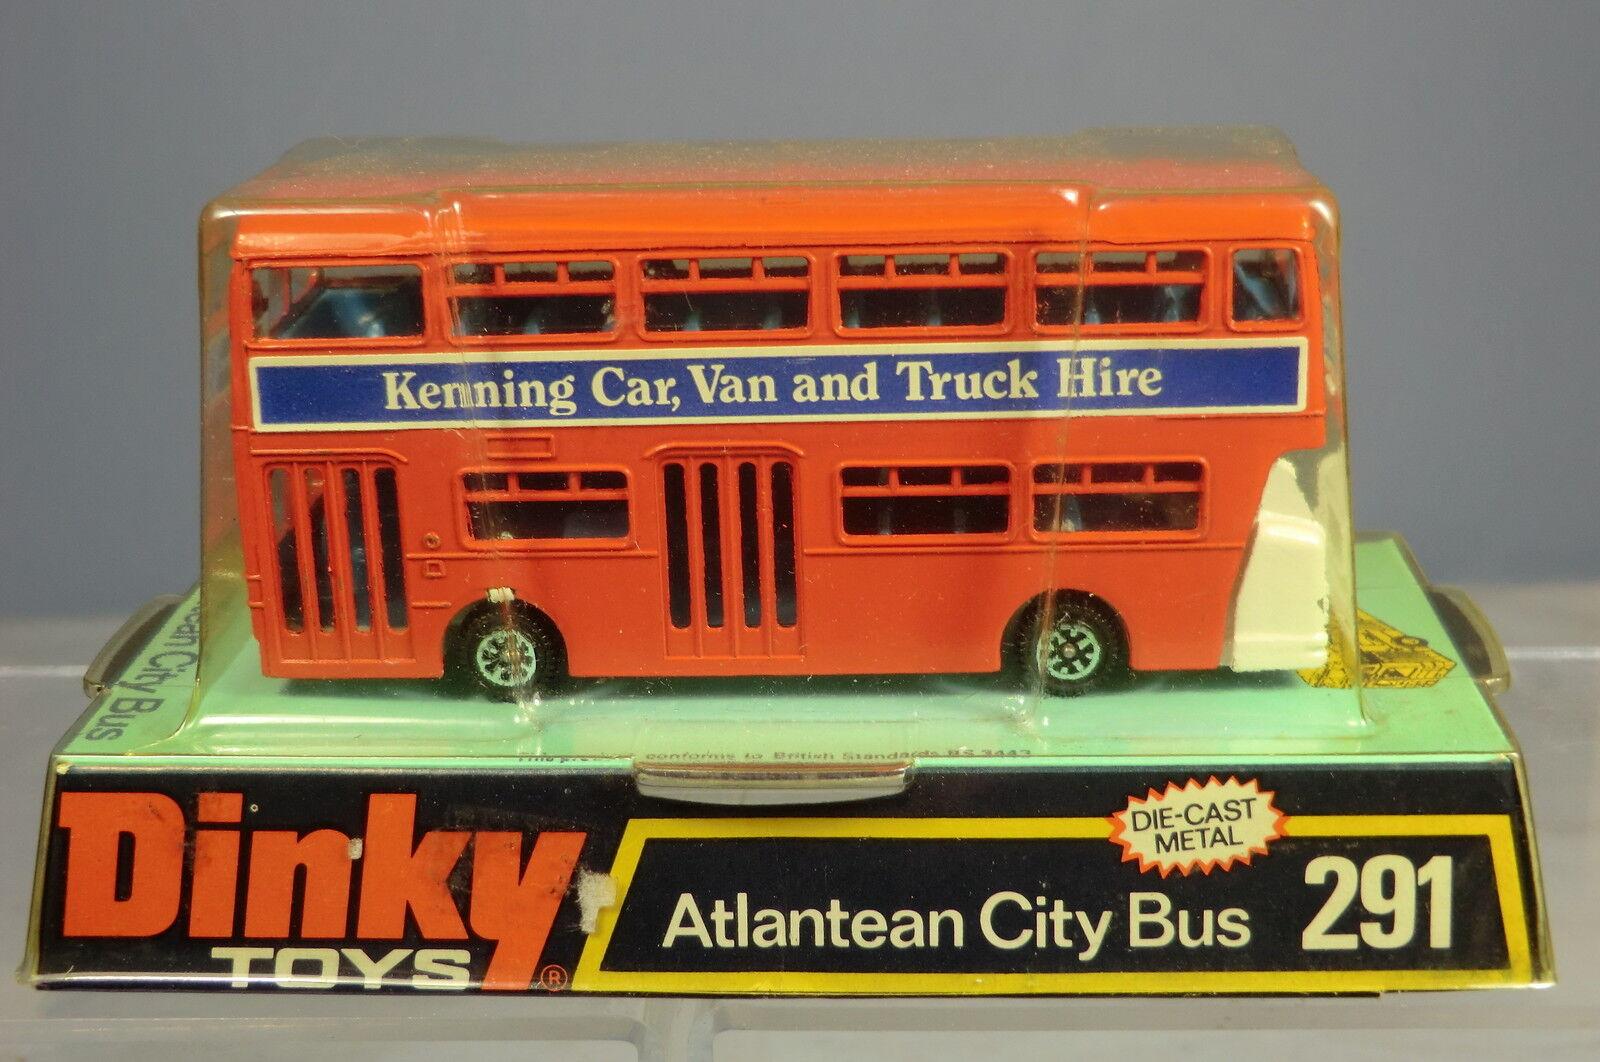 DINKY TOYS No.291 ATLANTEAN CITY BUS  'KENNING'   WHITE ENGINE COVER   MIB